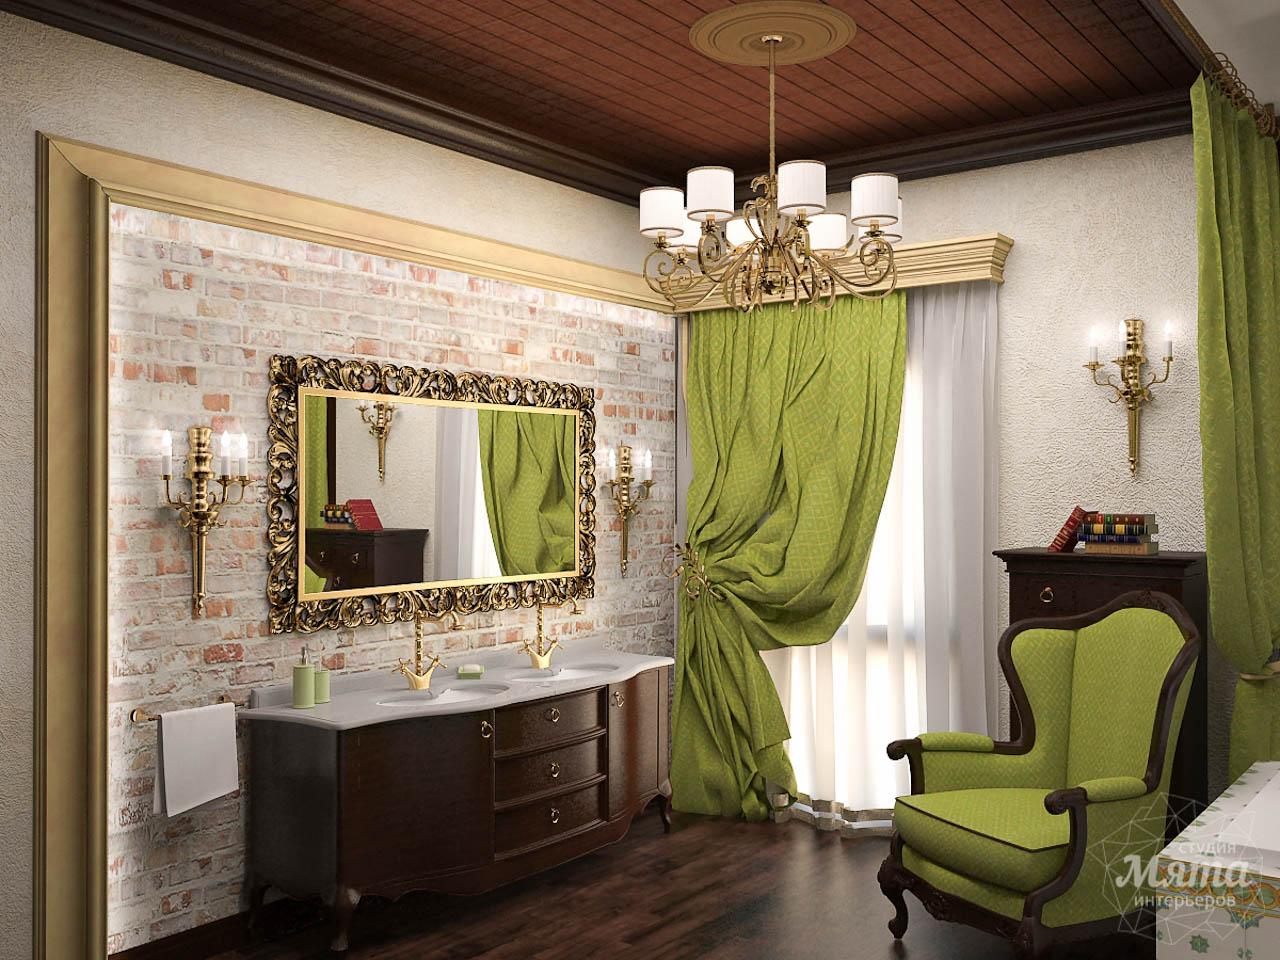 Дизайн интерьера коттеджа по ул. Ландышевая 23 img1422706970